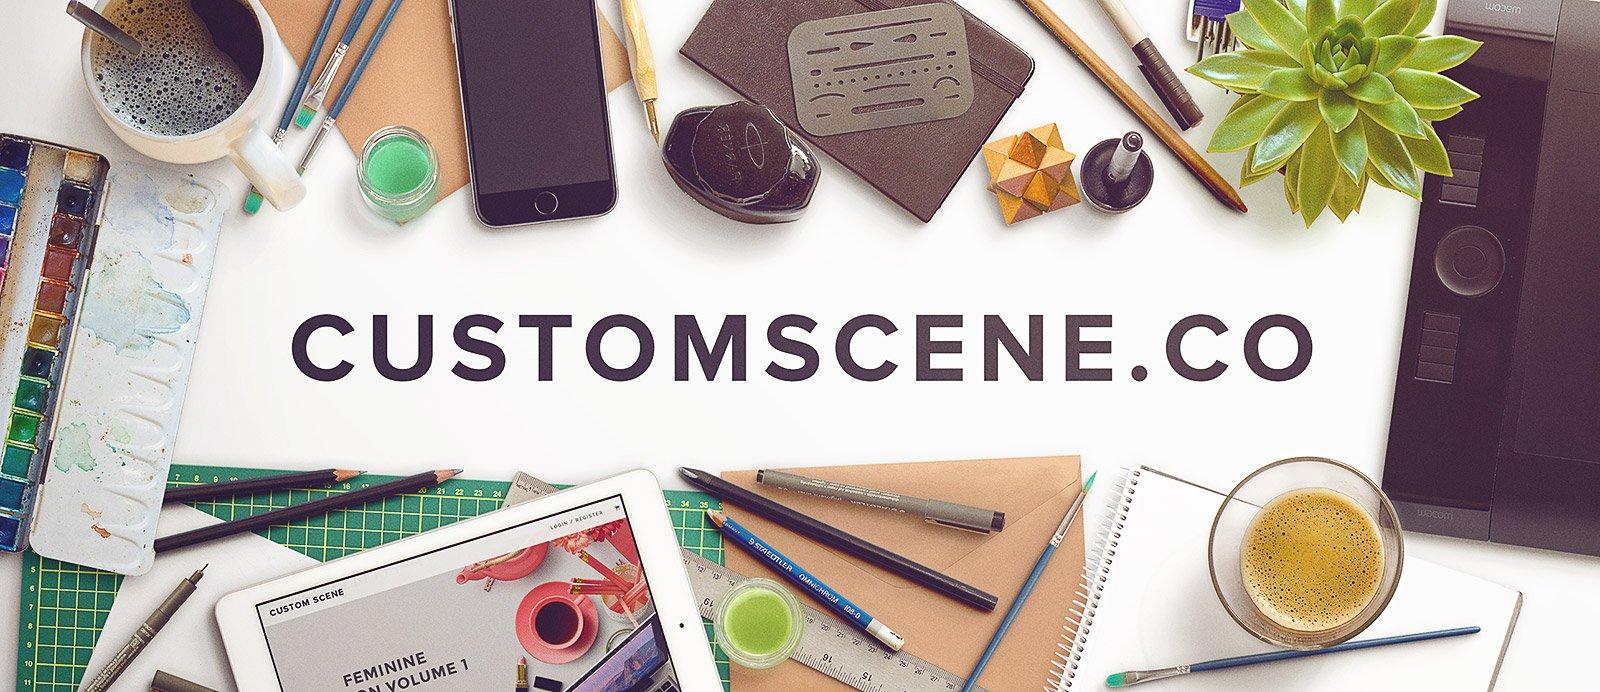 welcome customscene co